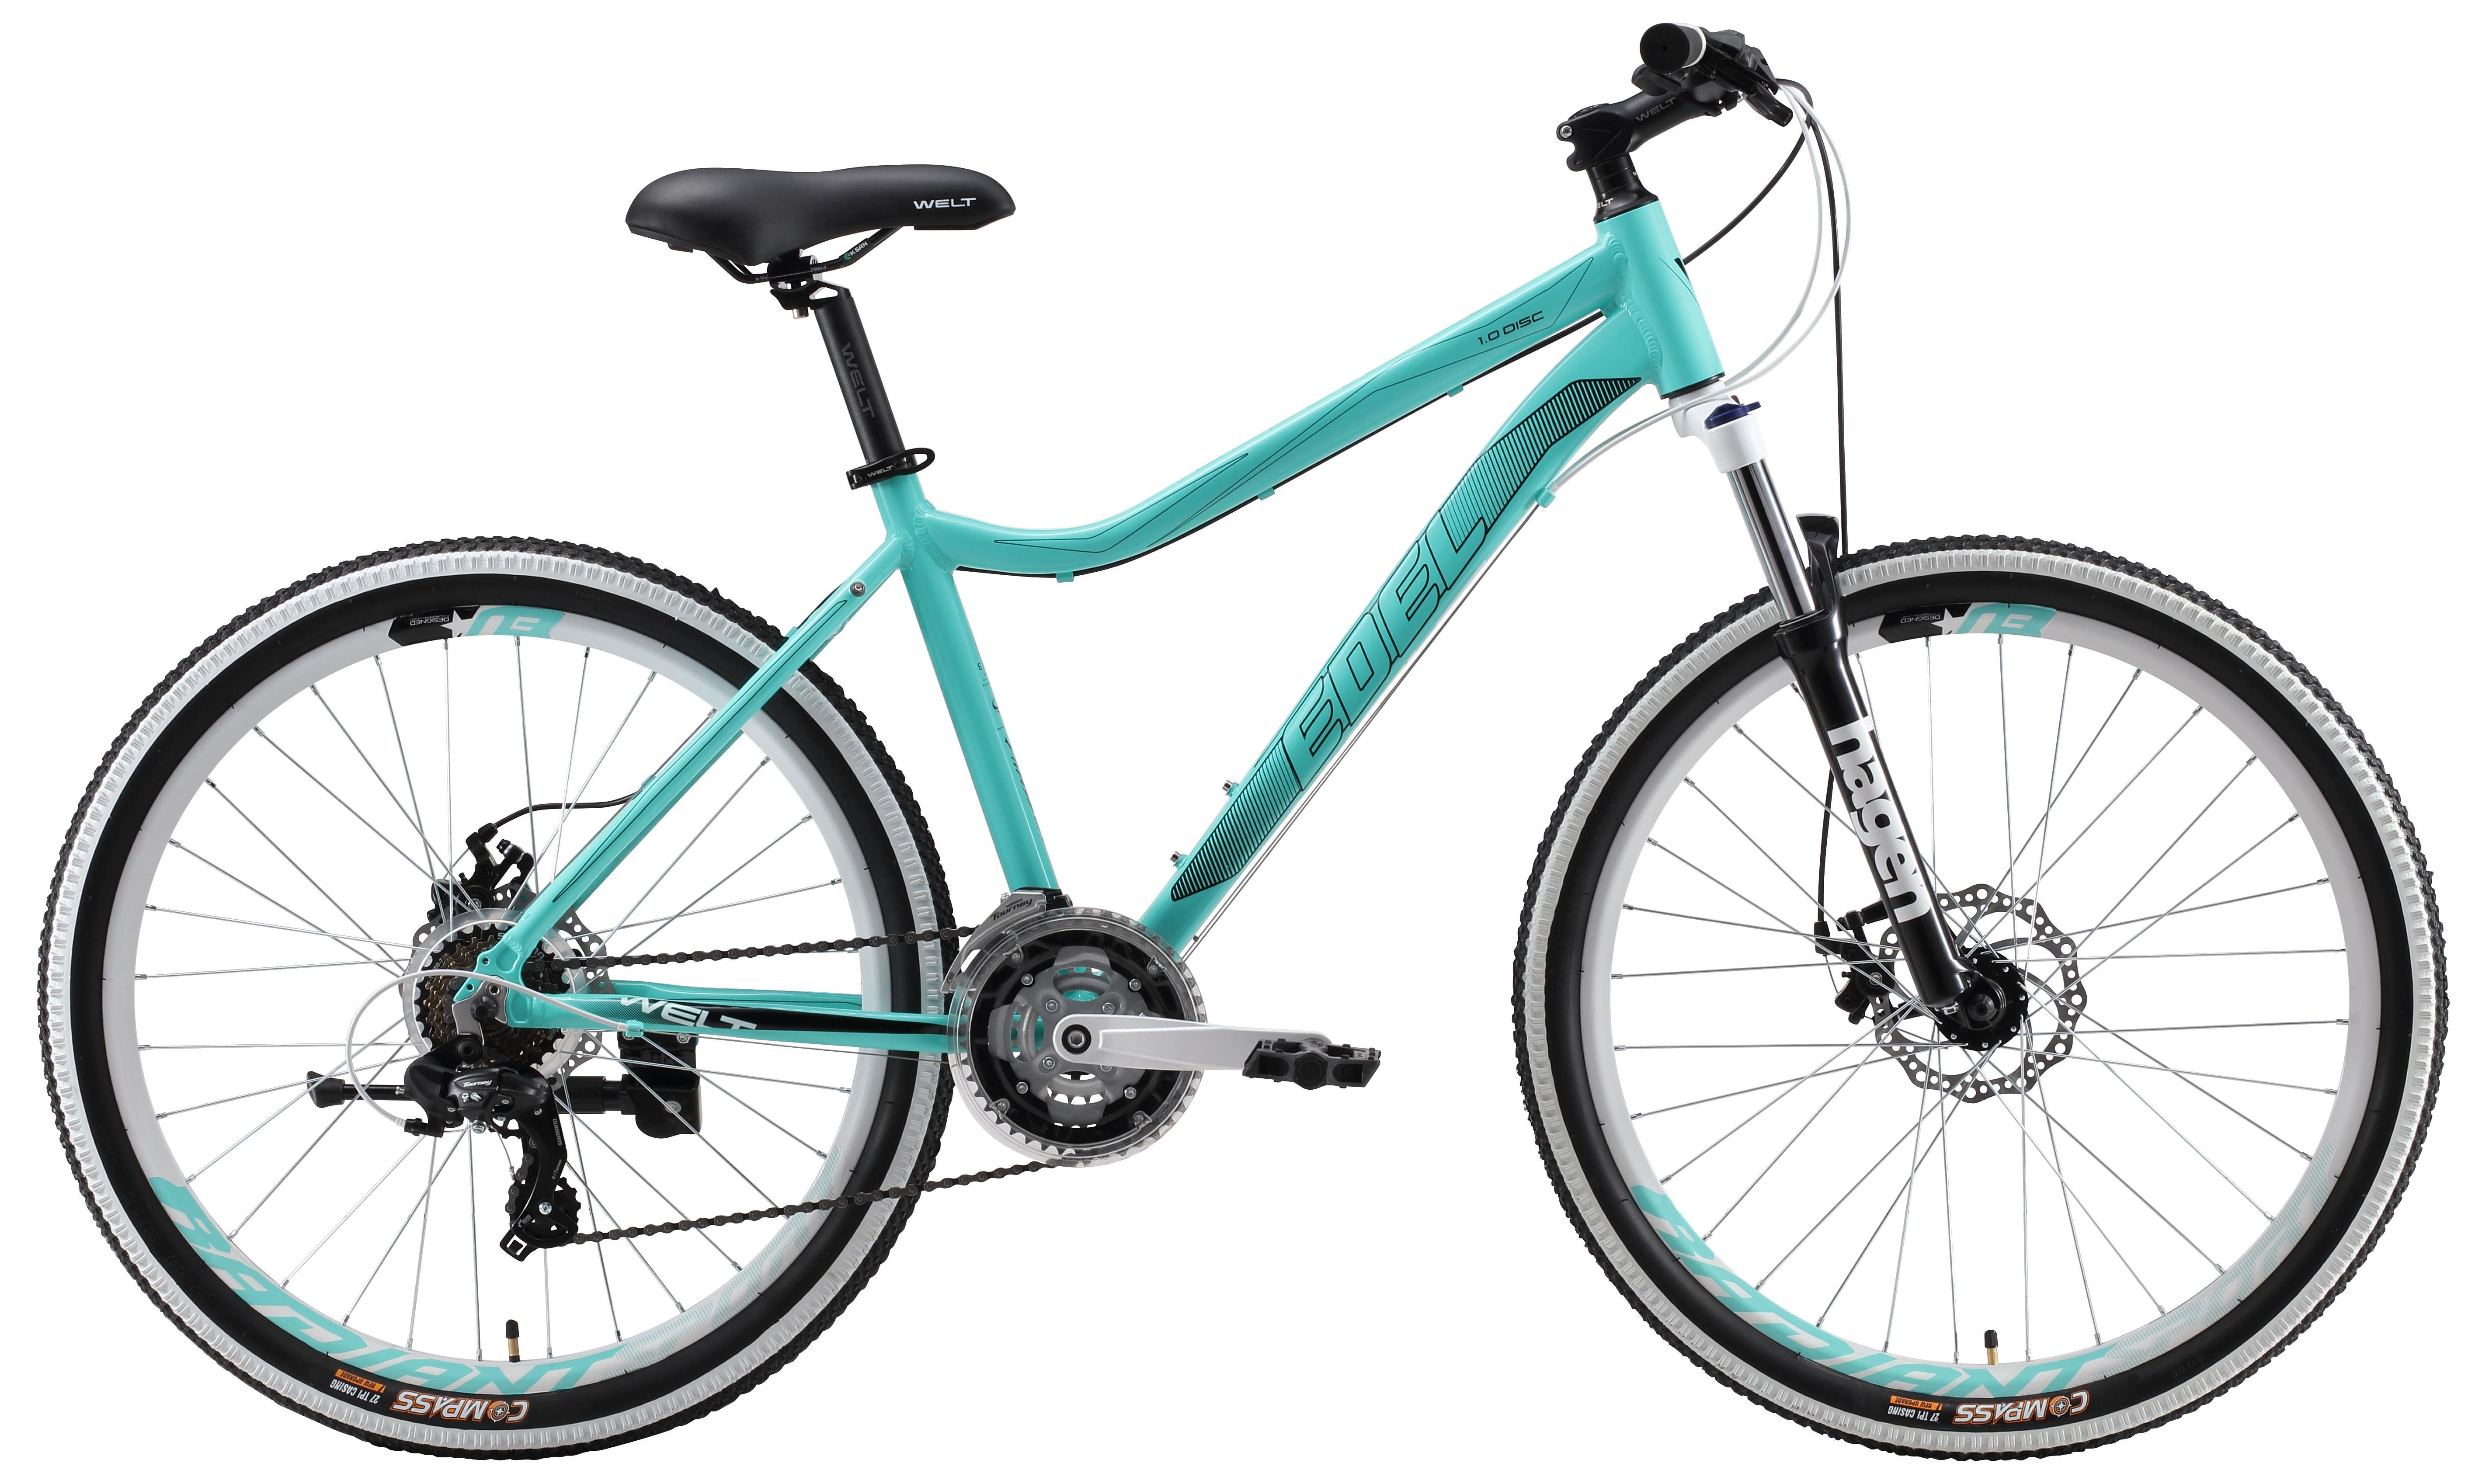 Велосипед Welt Edelweiss 1.0 D 2019 велосипед welt ridge 1 0 hd 2018